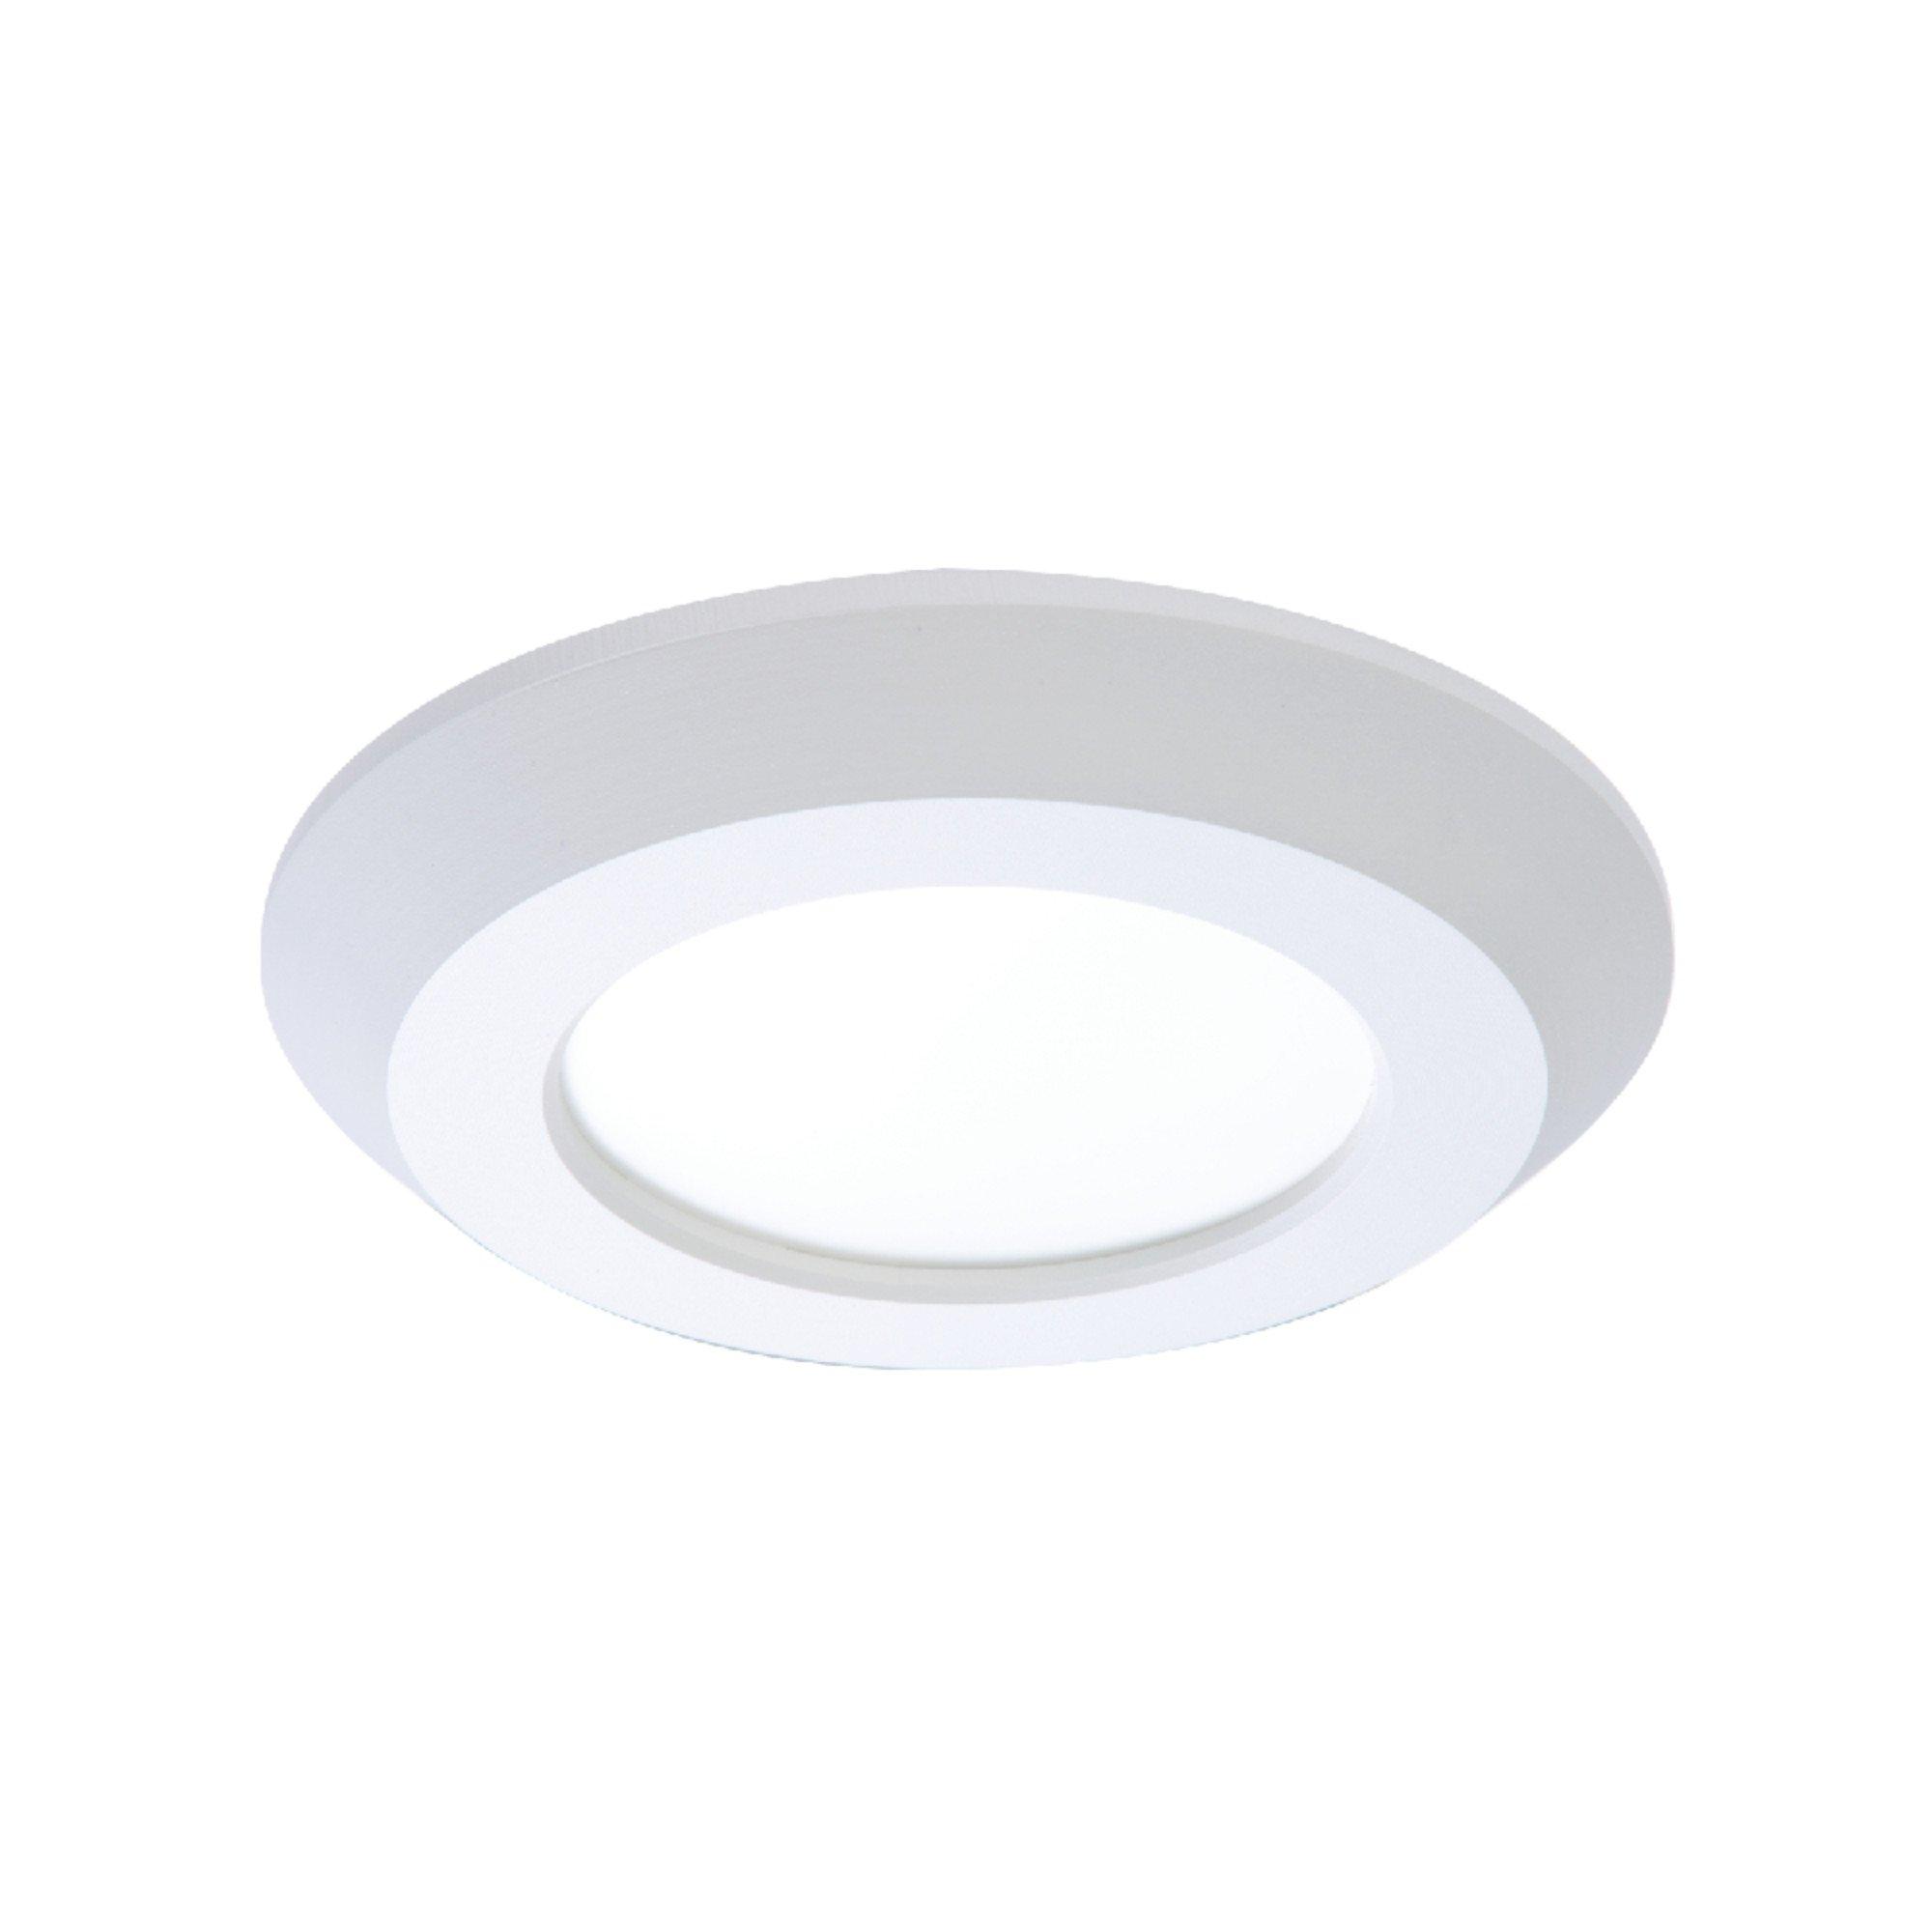 EATON Lighting SLD405930WHR 4'' LED Surface Light